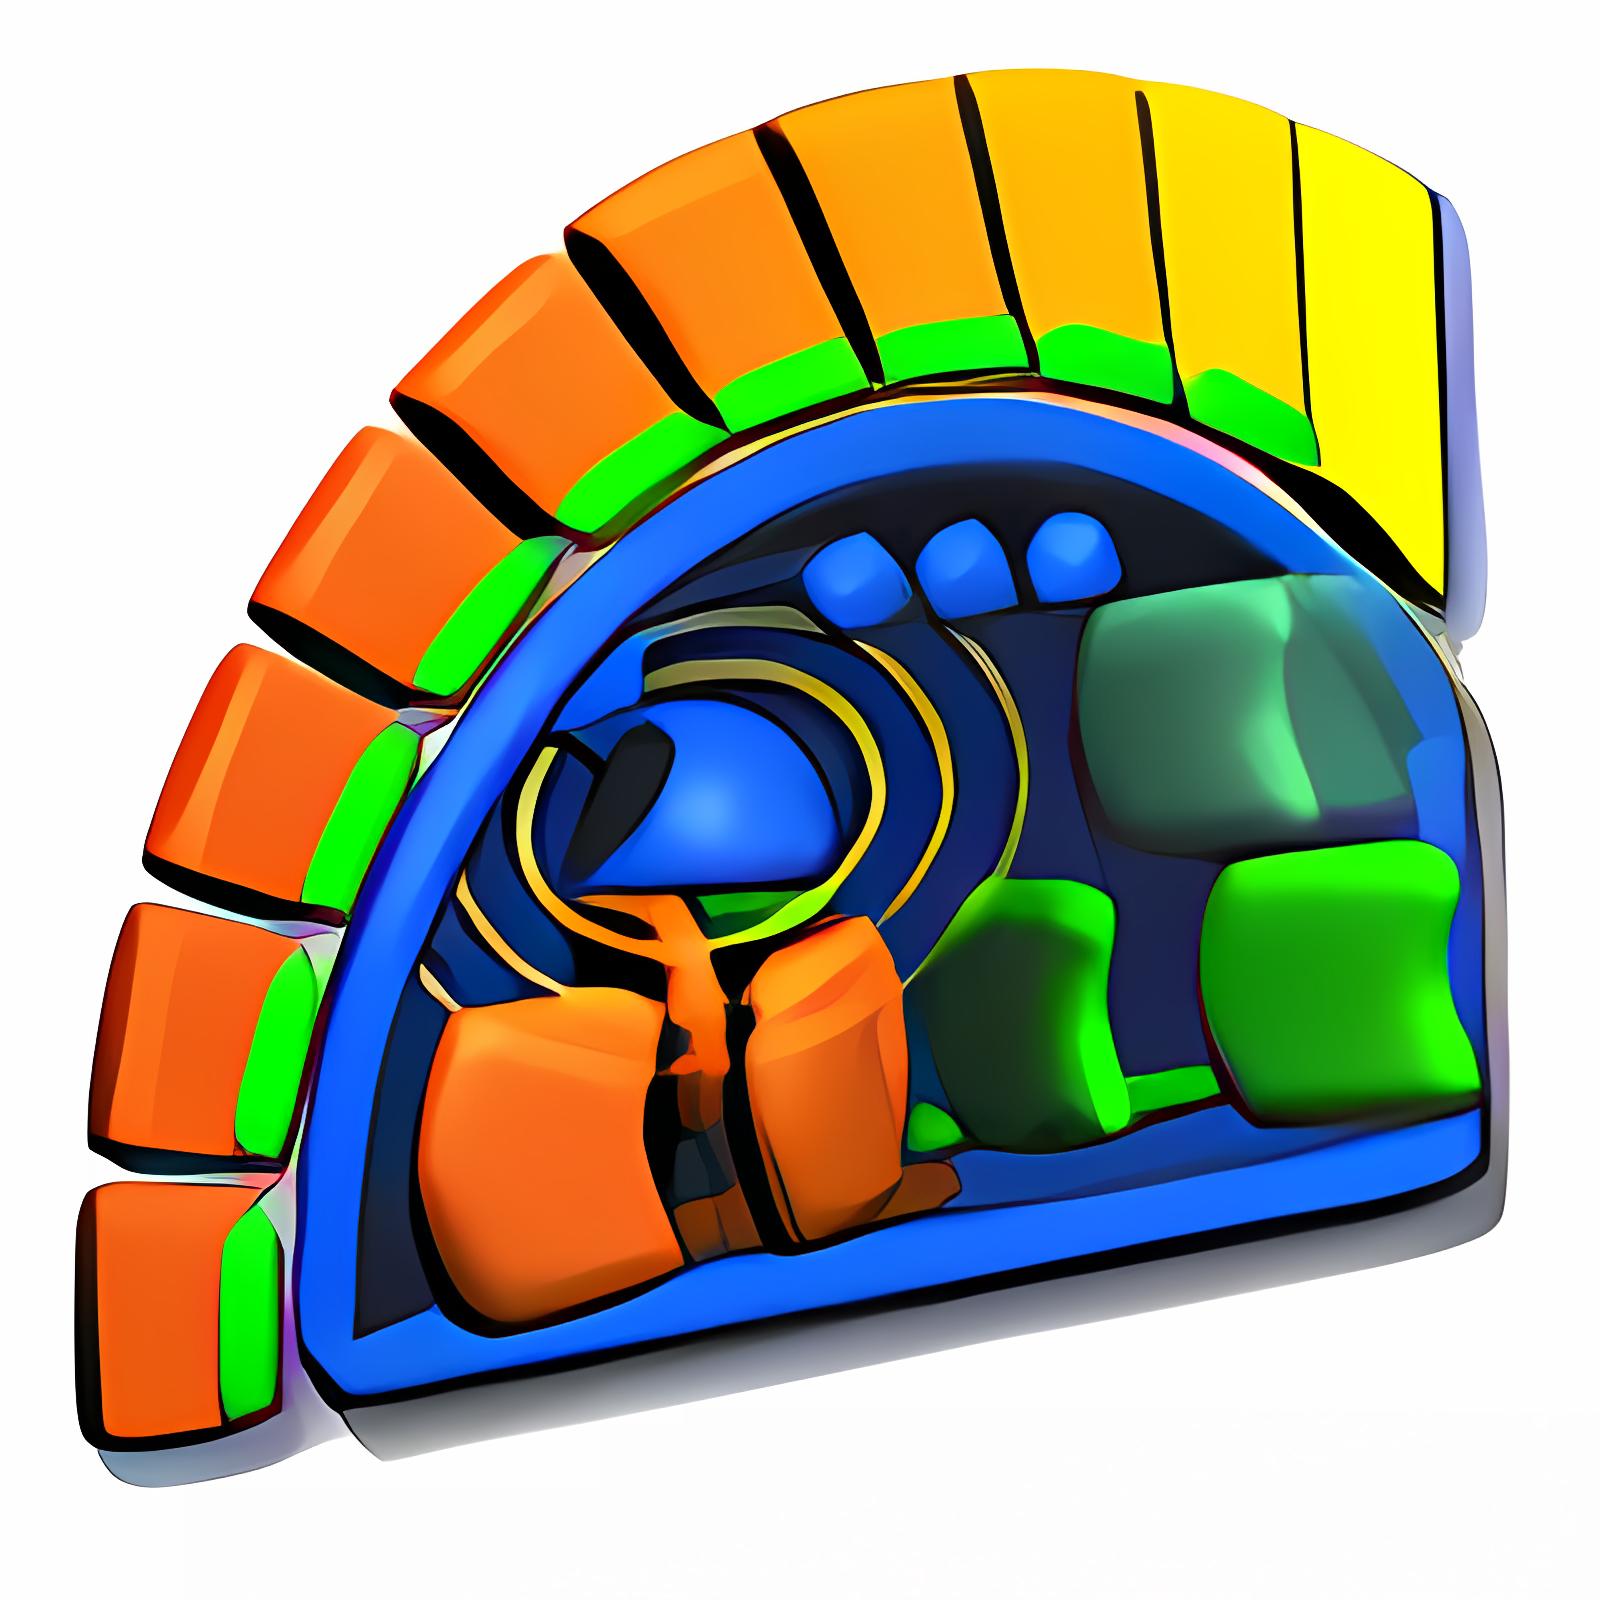 cFosSpeed 64-bit 9.60